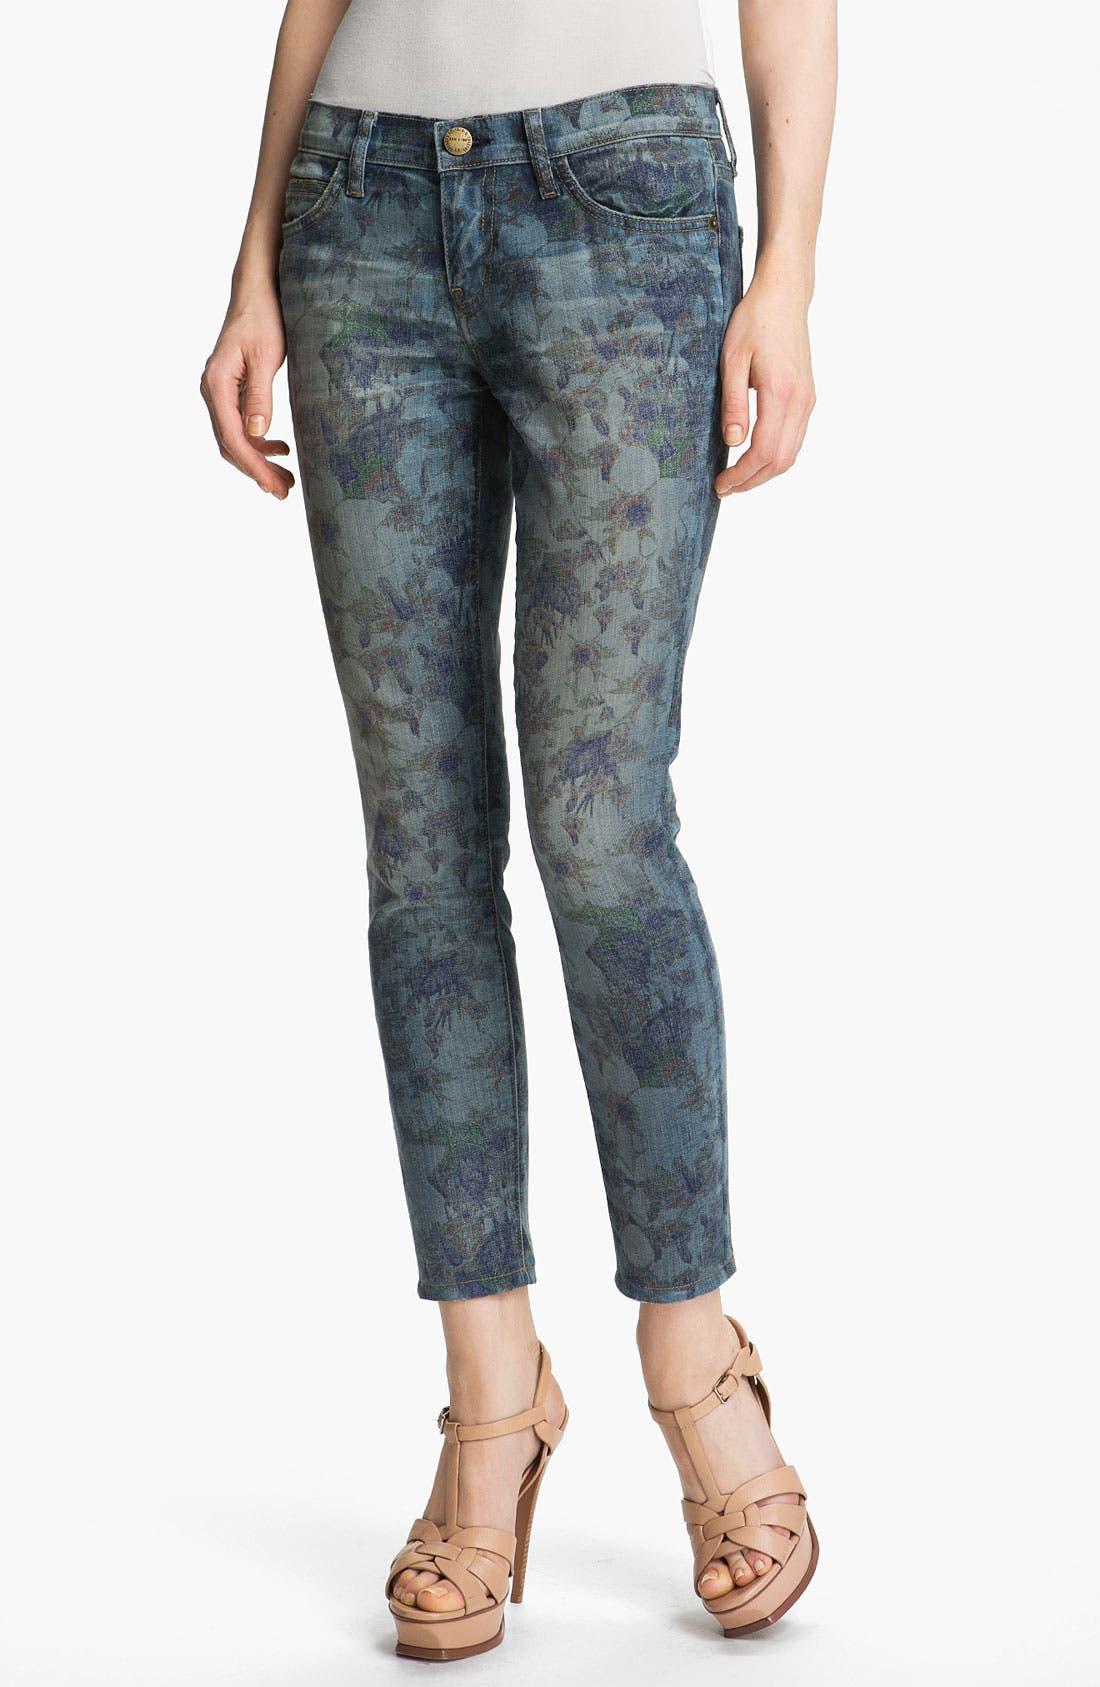 Alternate Image 1 Selected - Current/Elliott 'The Stiletto' Burnout Floral Print Stretch Jeans